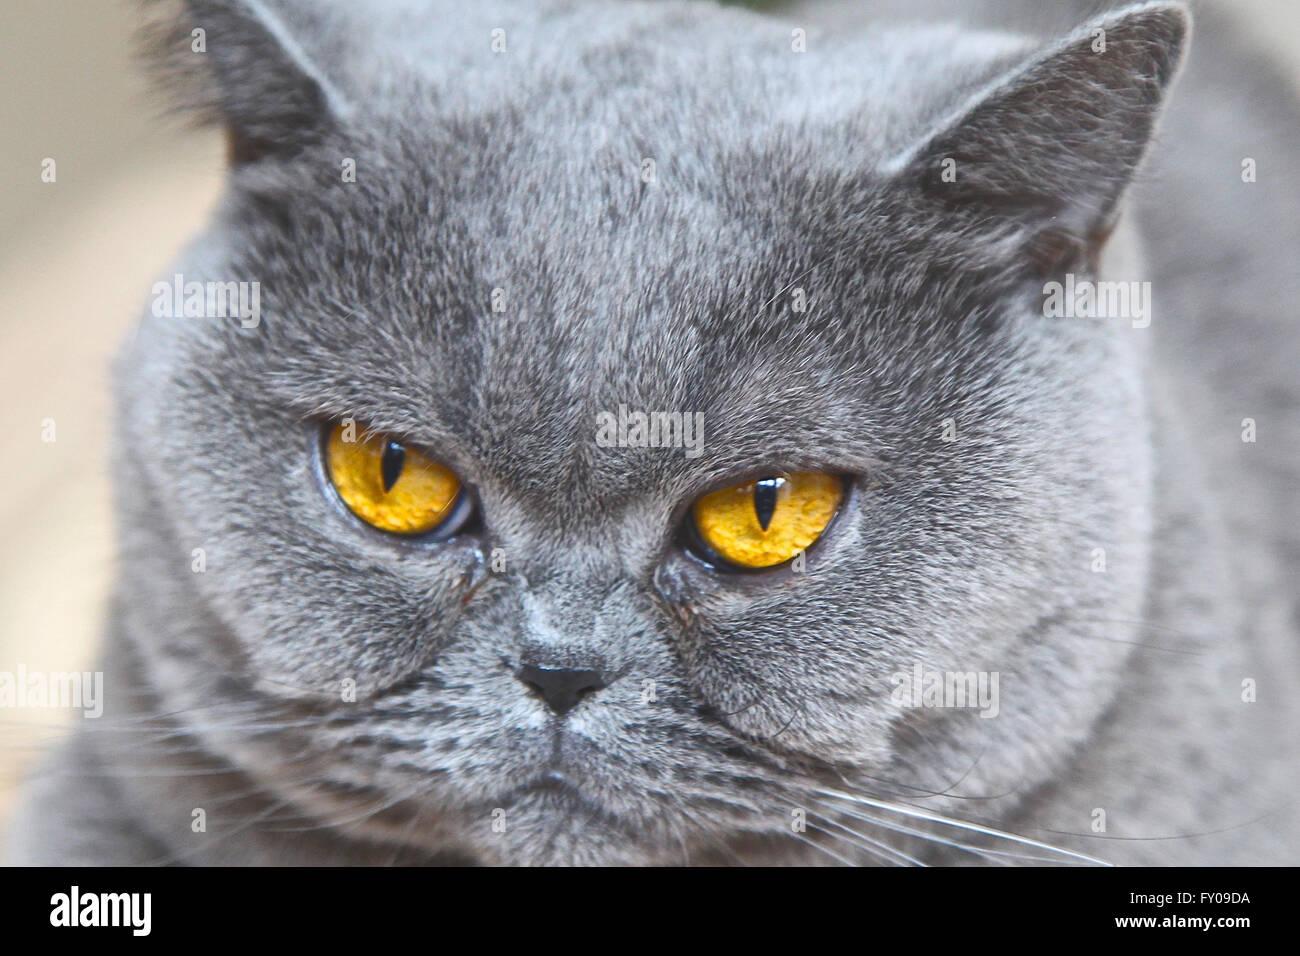 Cat Breed British Shorthair Similar Breeds